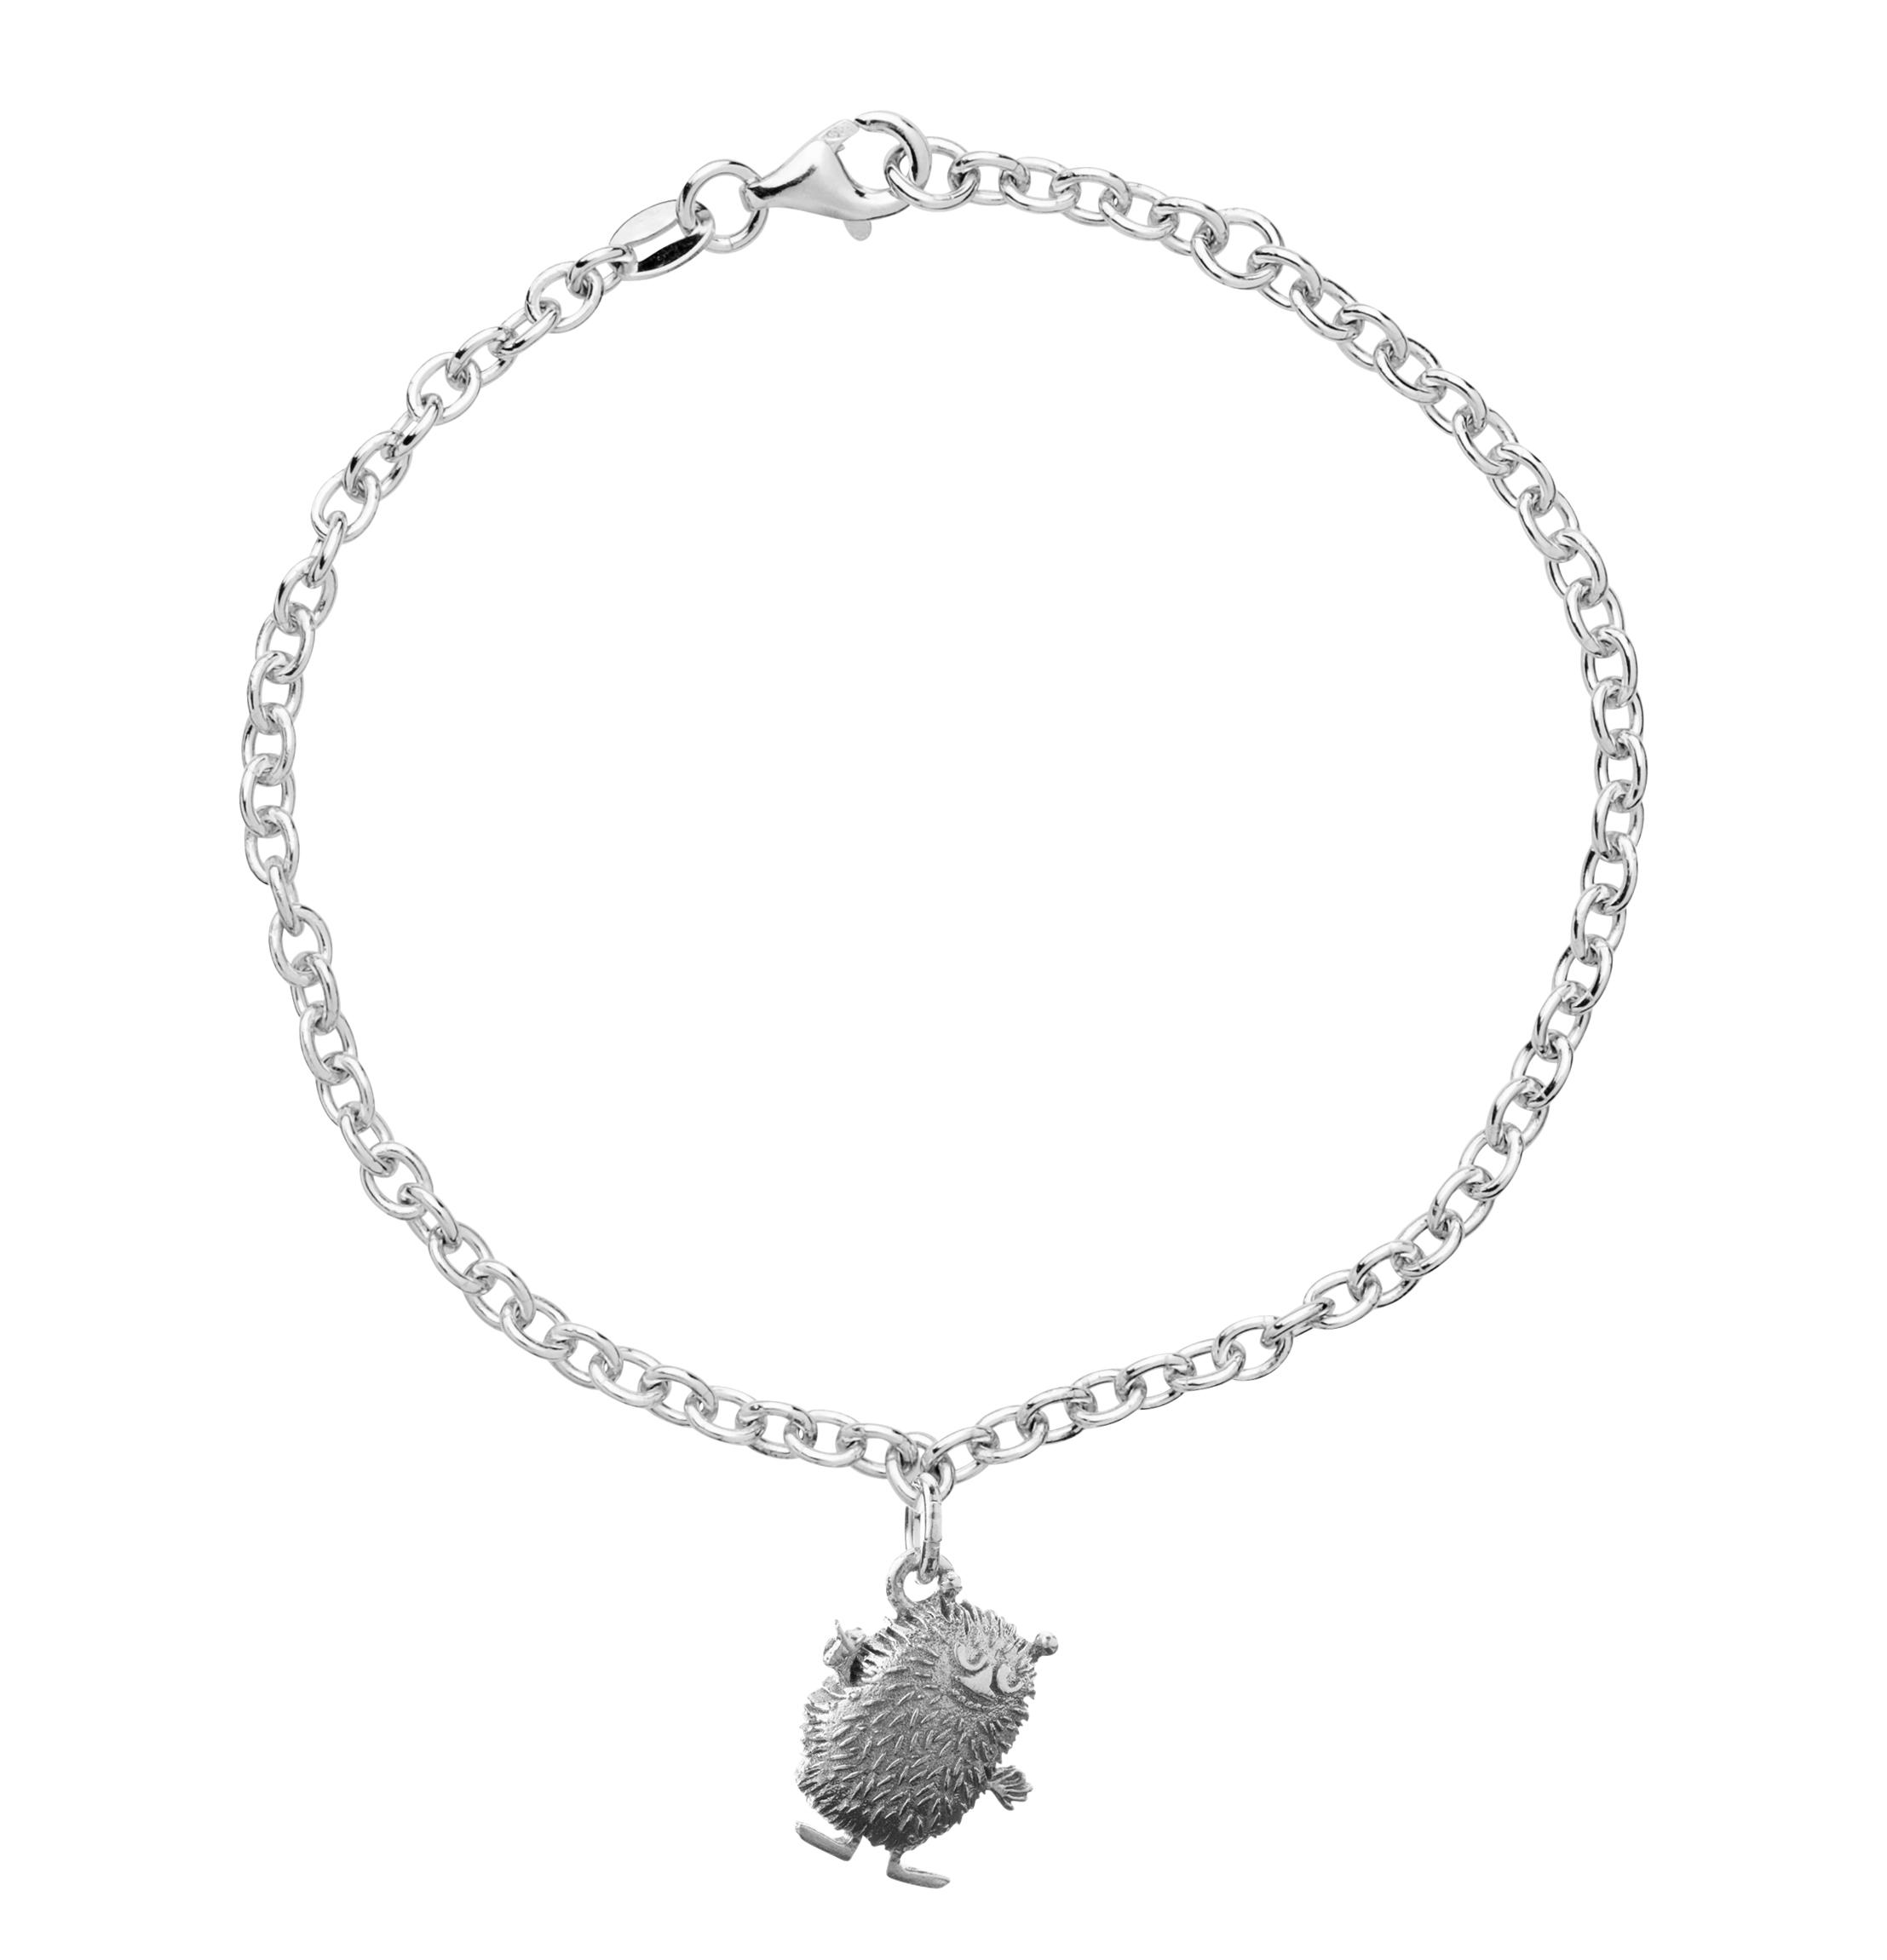 Saurum Stinky silver bracelet